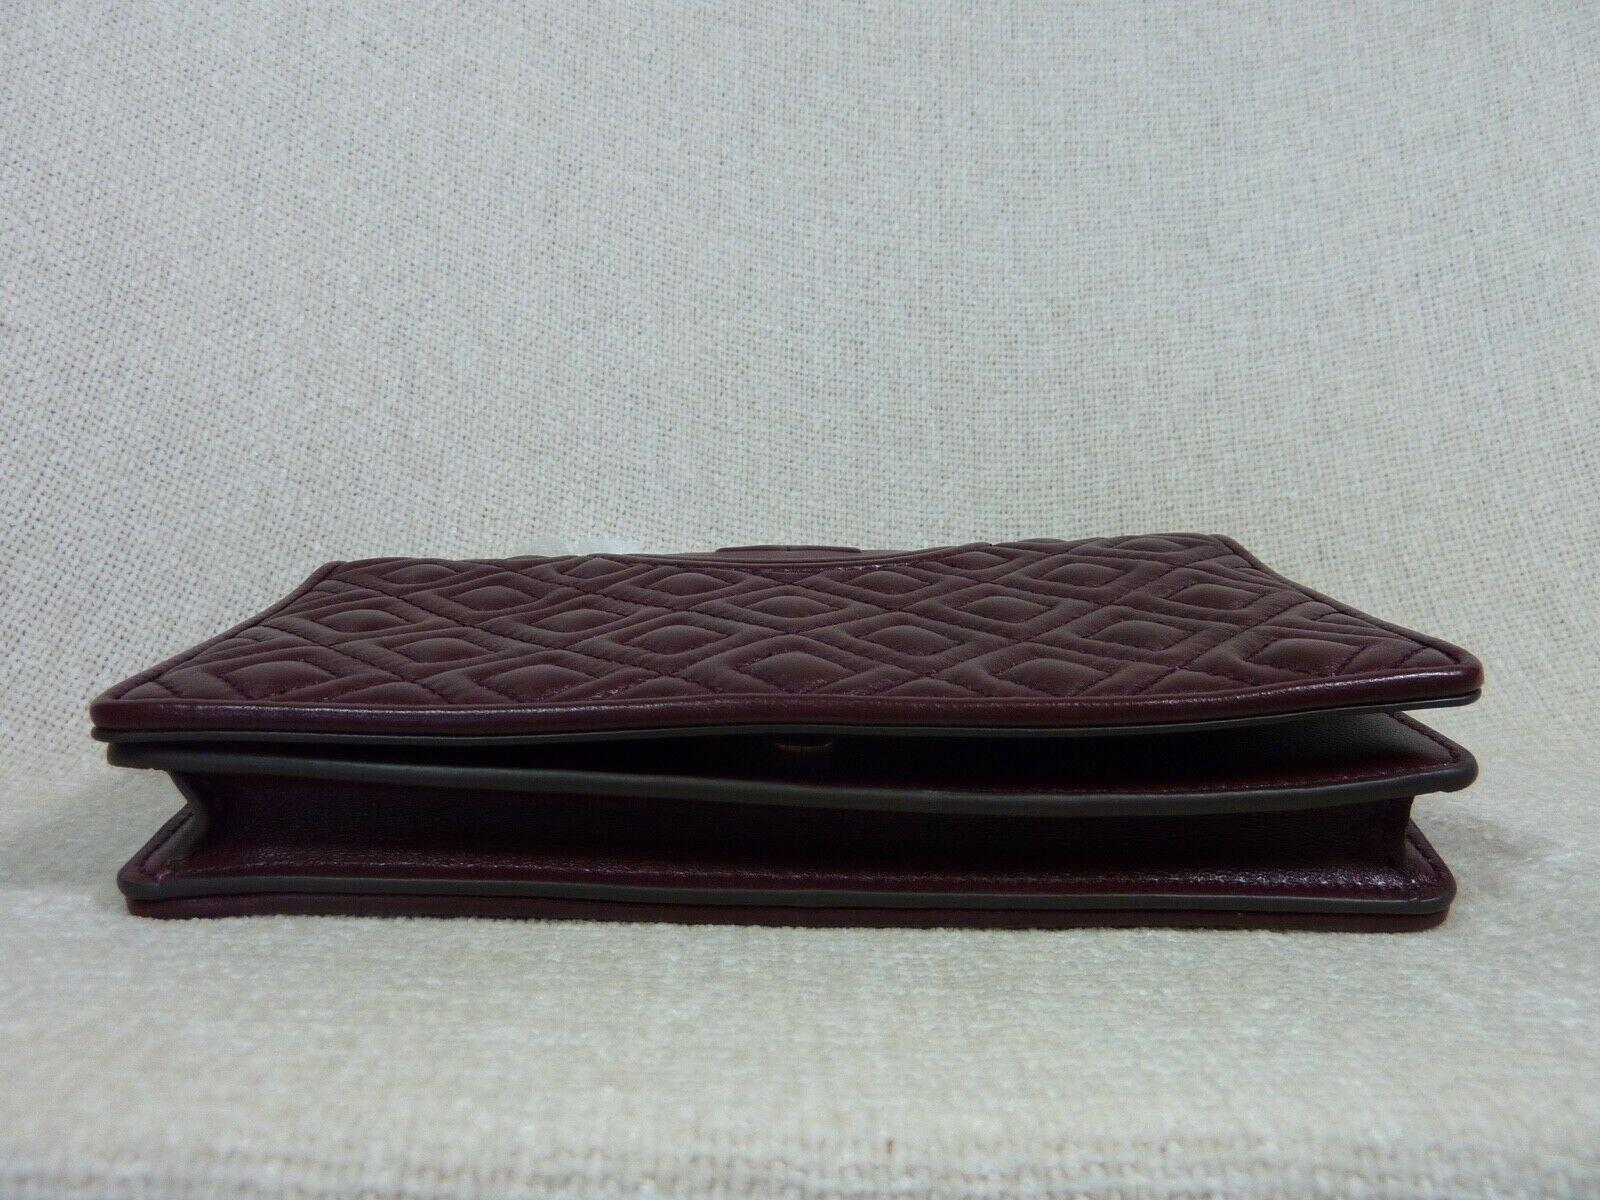 NWT Tory Burch Claret Fleming Wallet Cross Body Bag $328 image 5